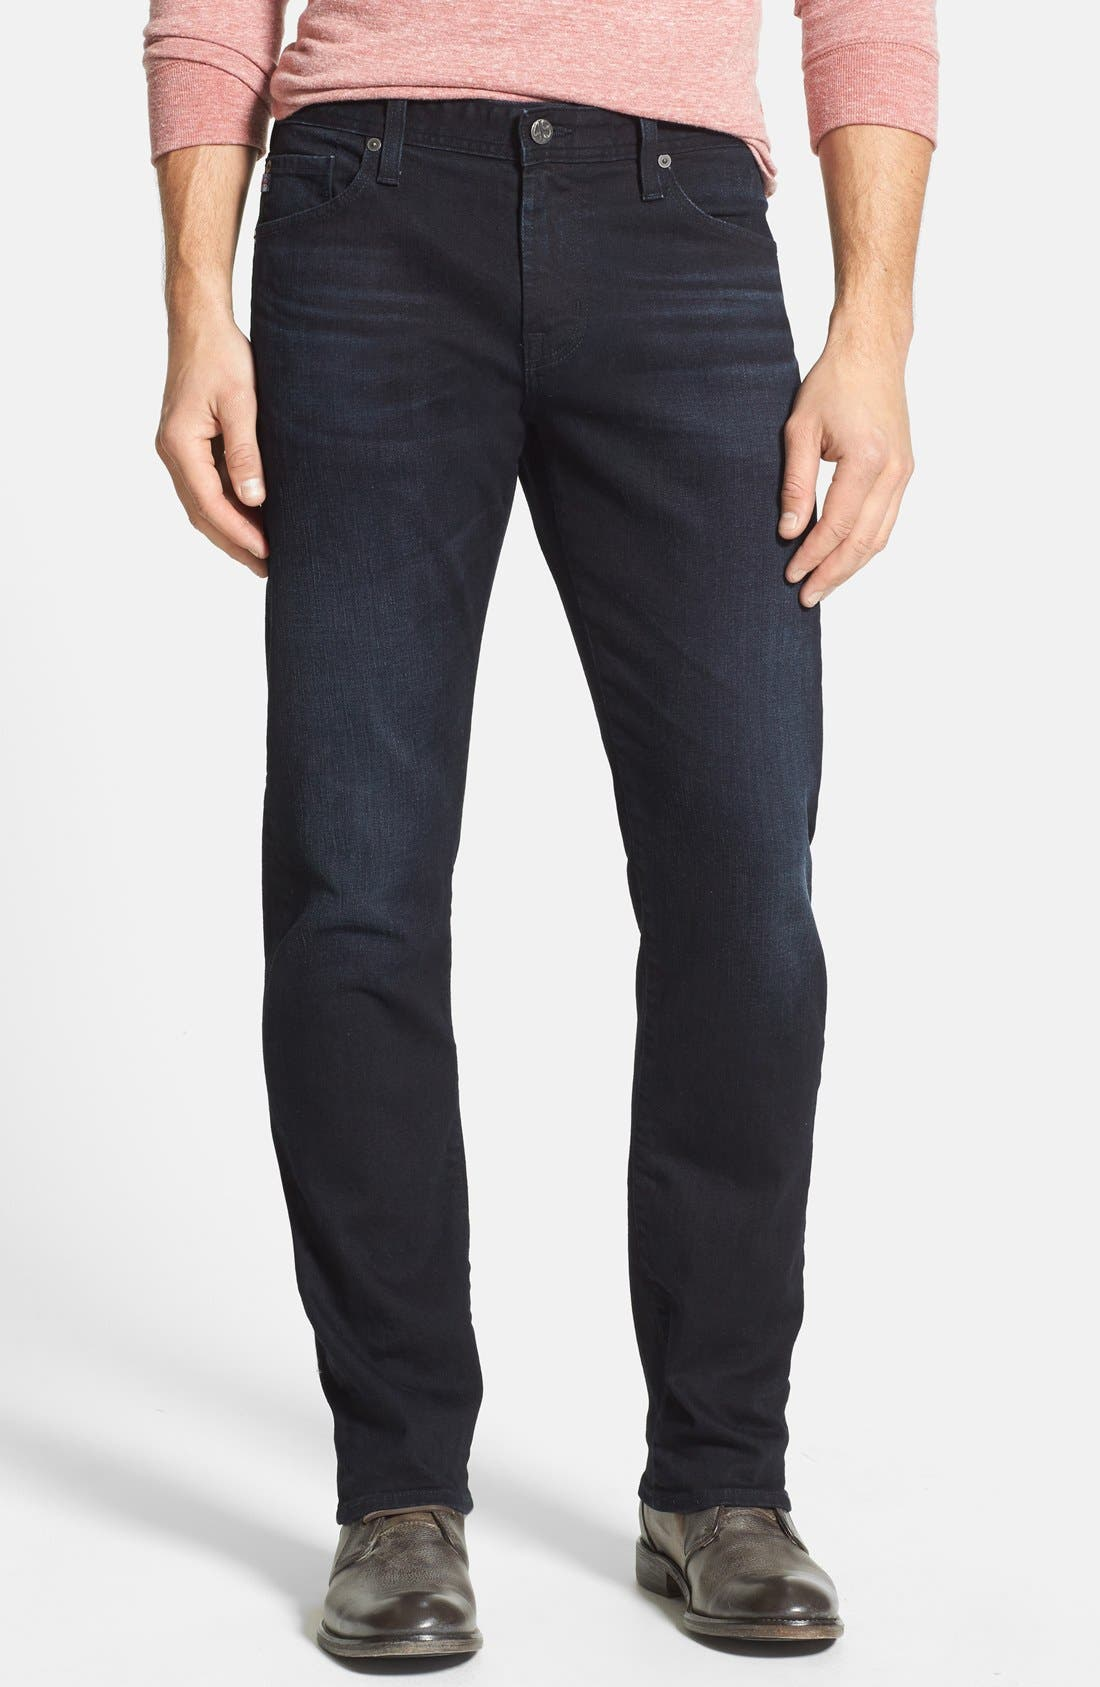 Main Image - AG 'Graduate' Tailored Straight Leg Jeans (3 Years Deep Midnight)